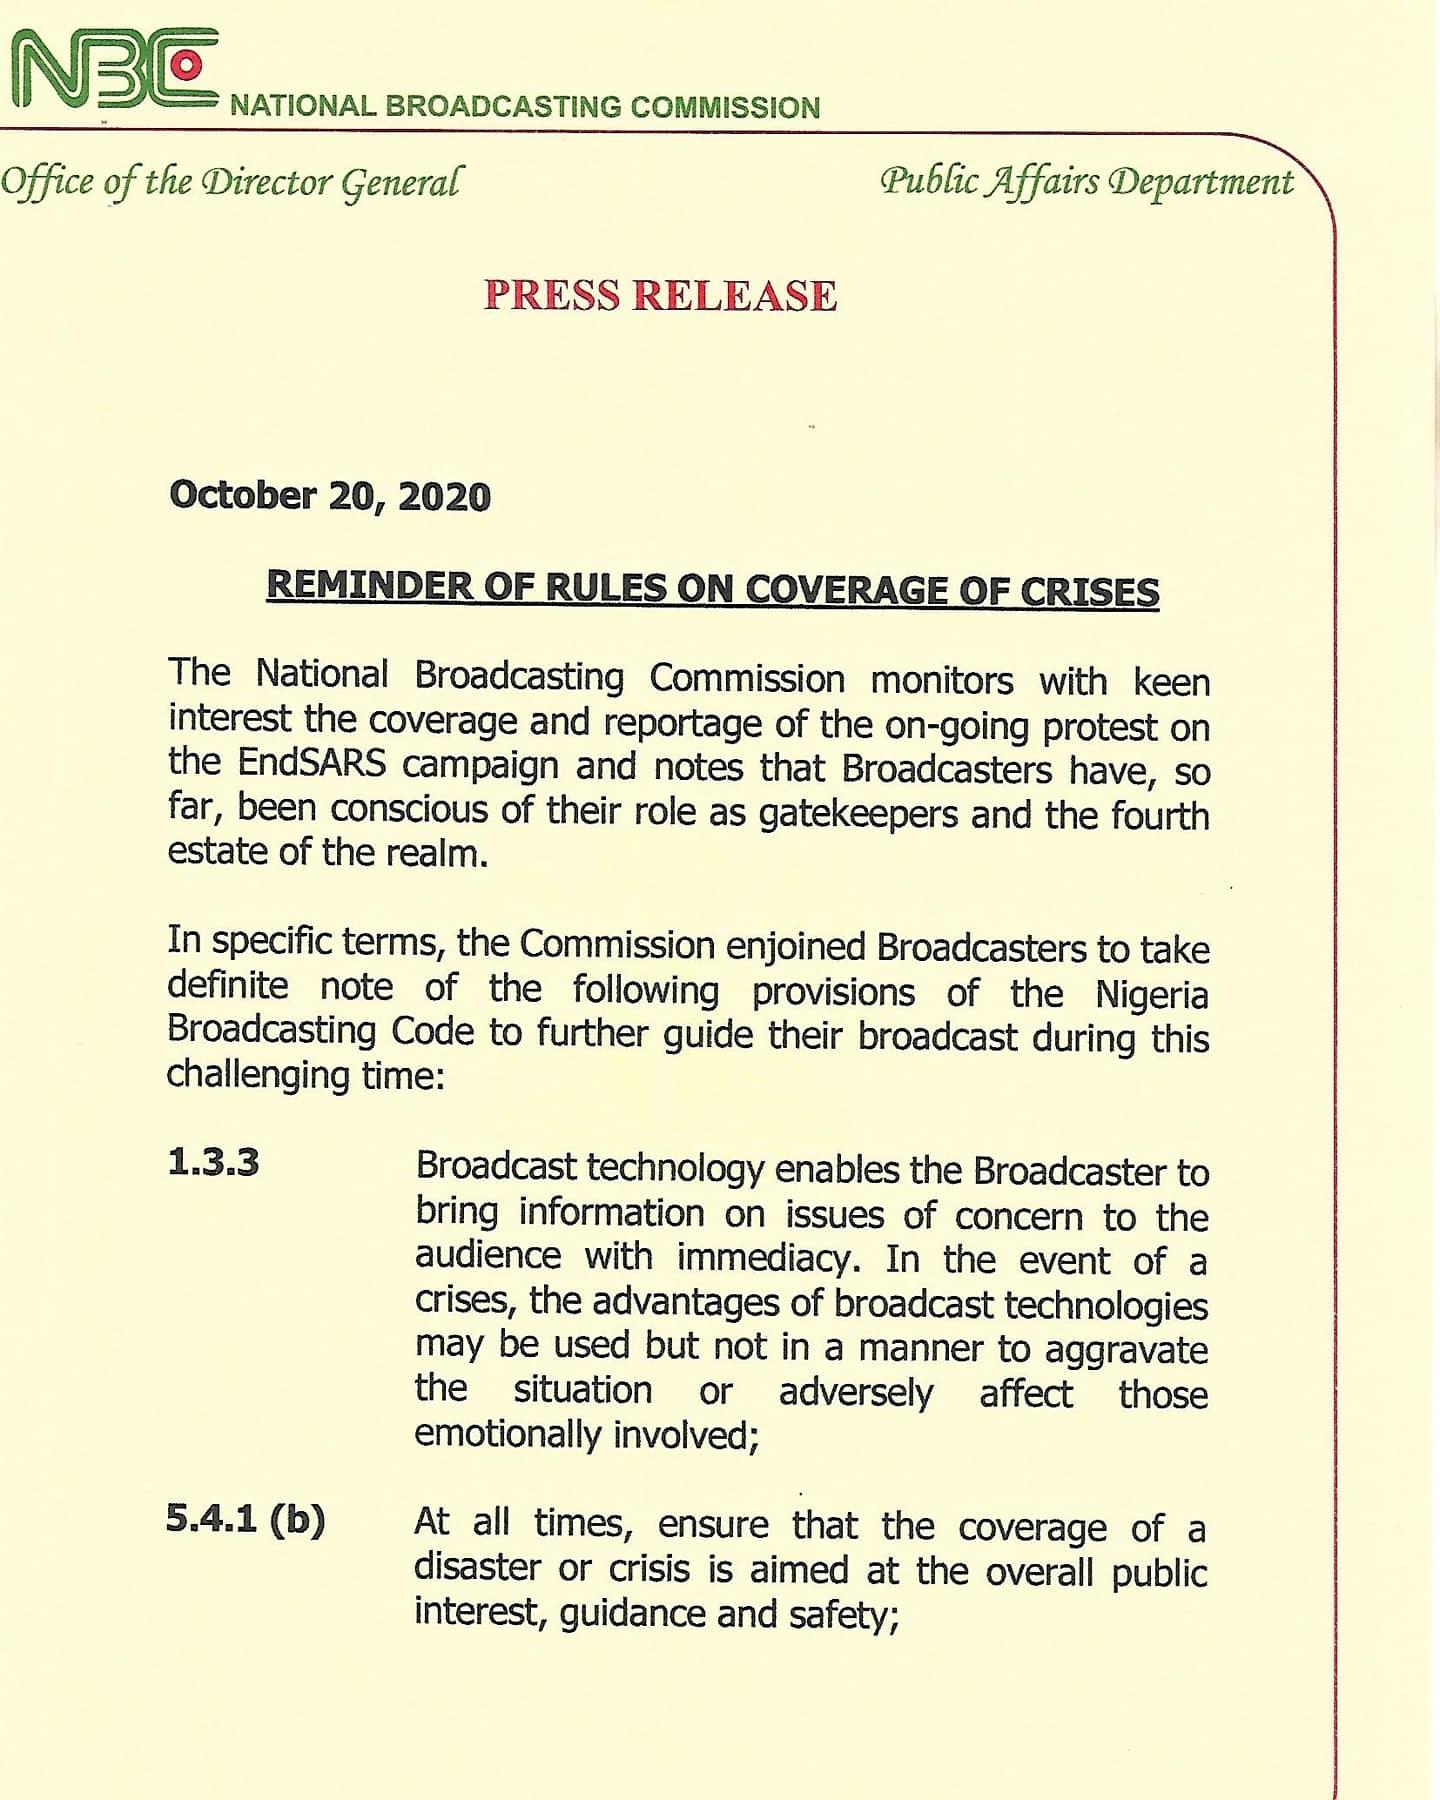 NBC Fines Channels TV, AIT, Arise TV N9m Over #EndSARS Coverage